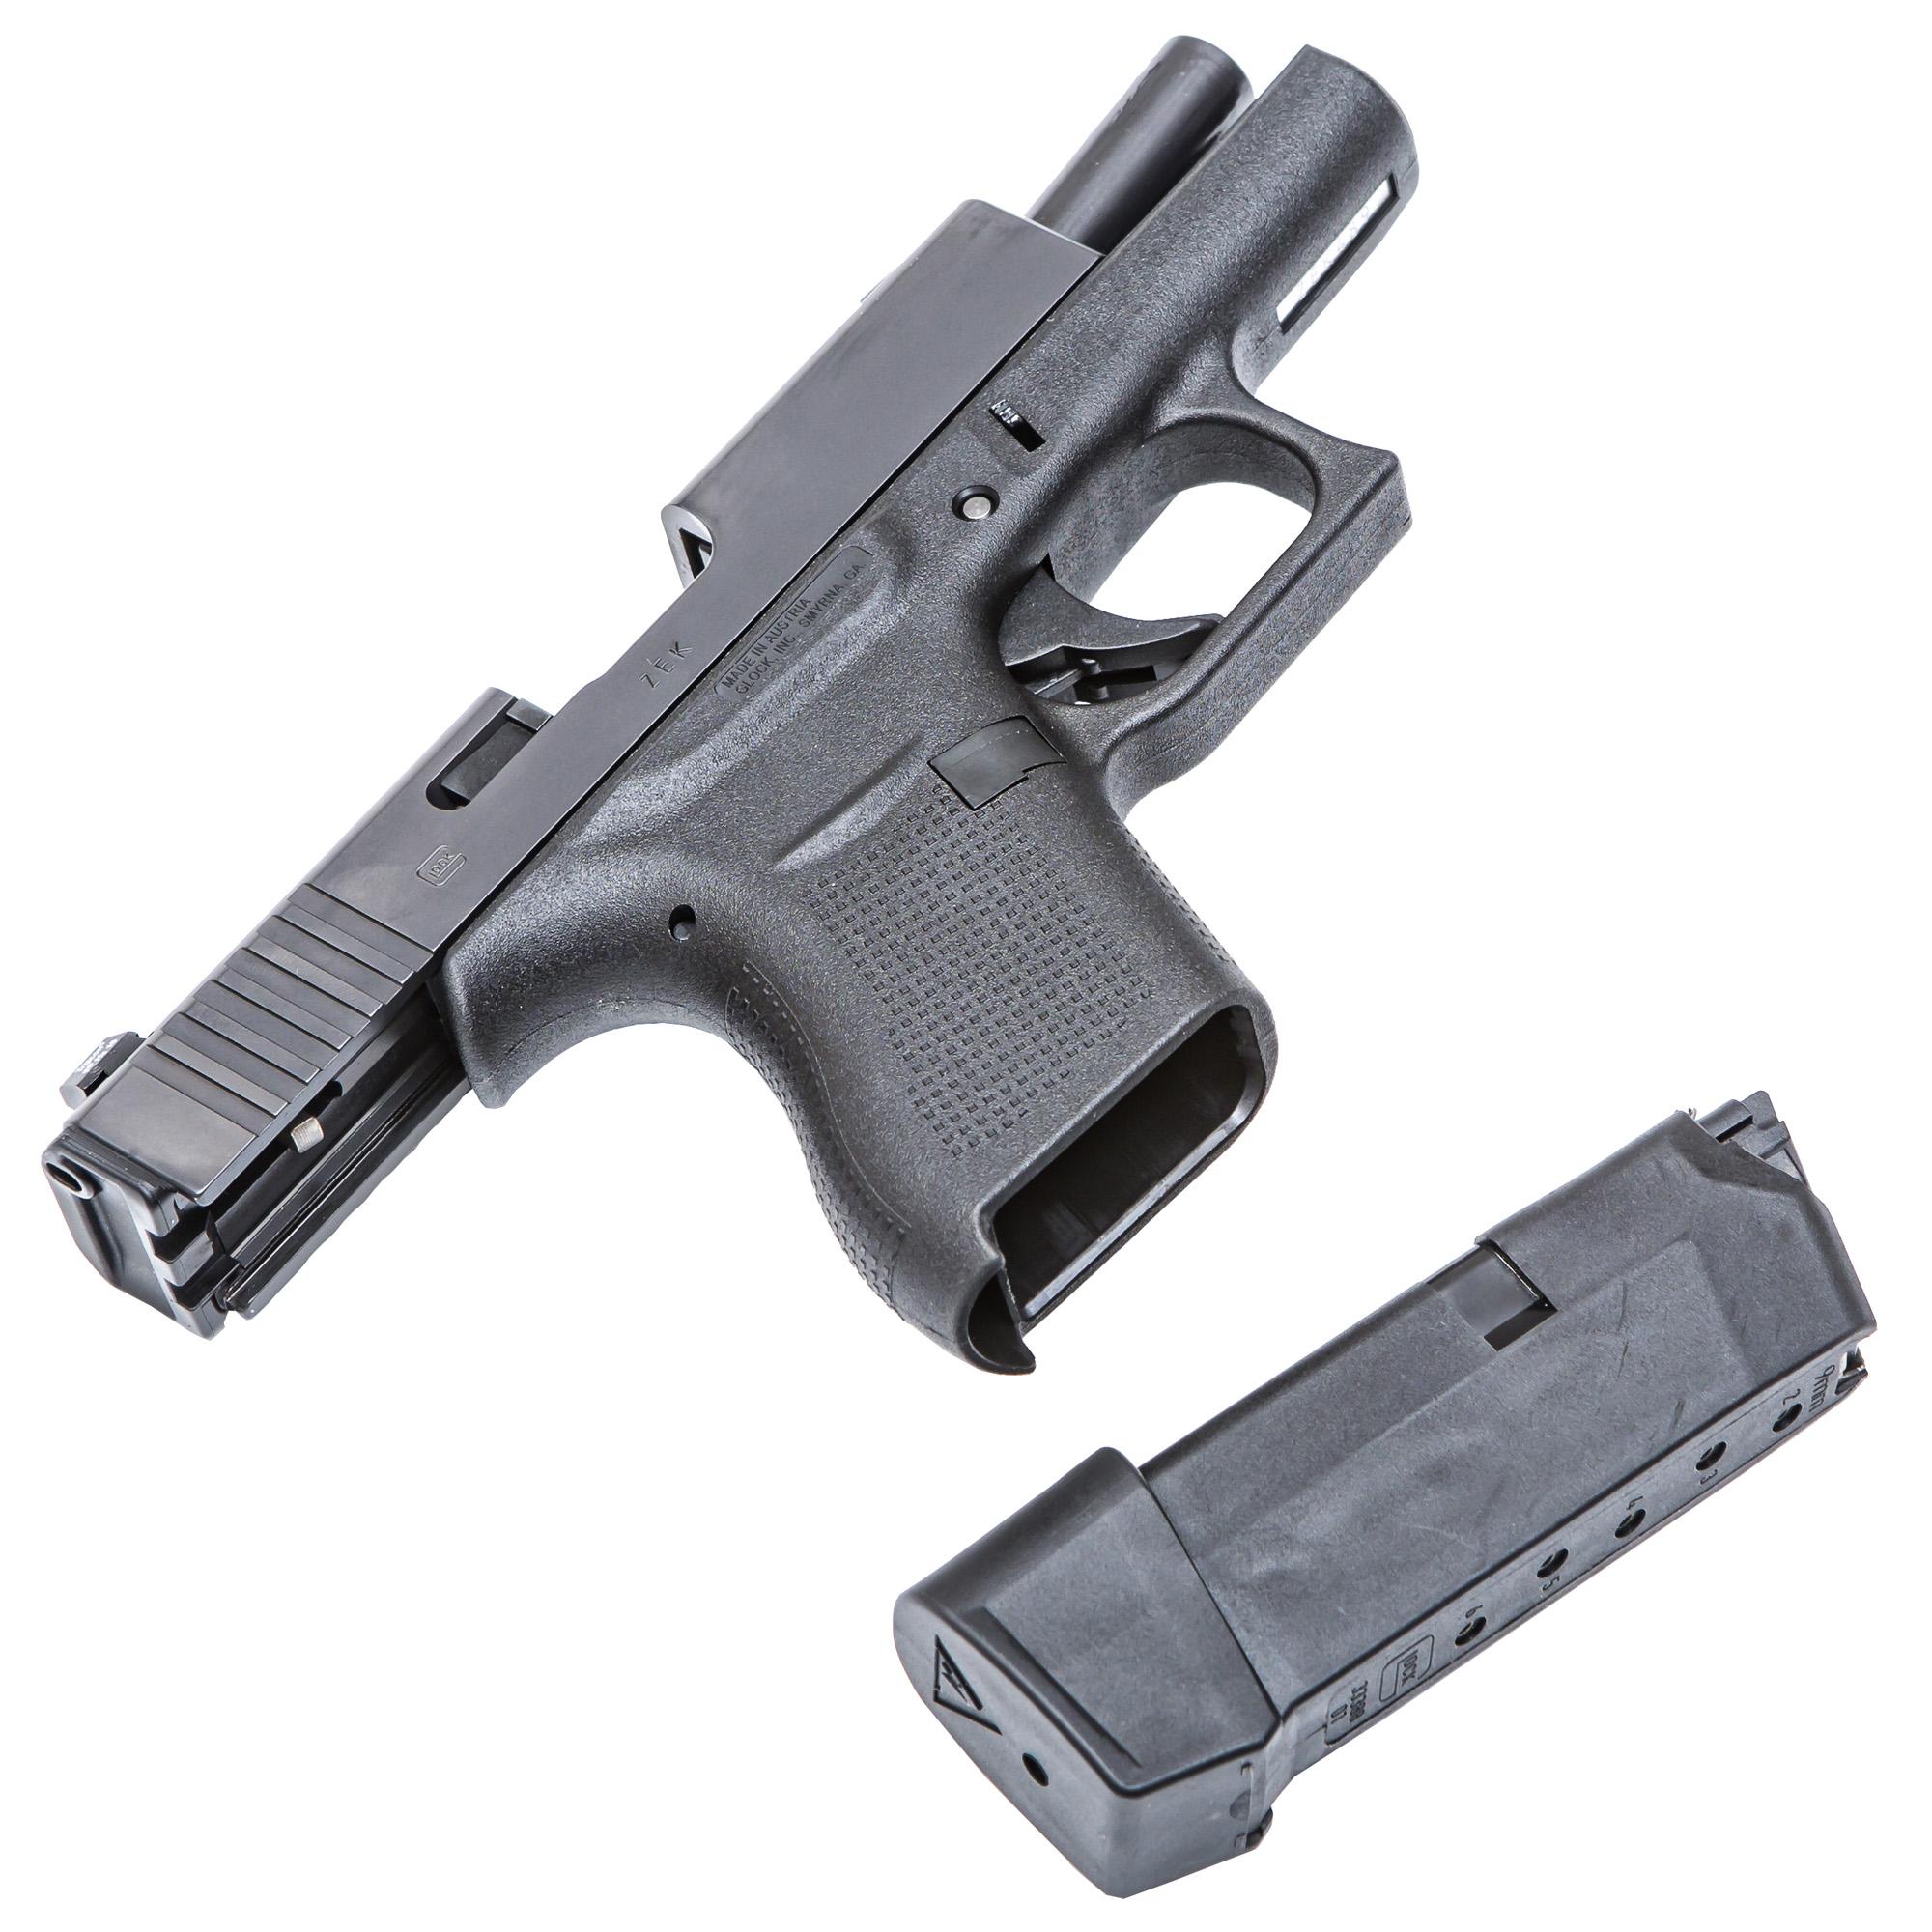 TangoDown Vickers Tactical Slide Racker For Glock G43 - Black